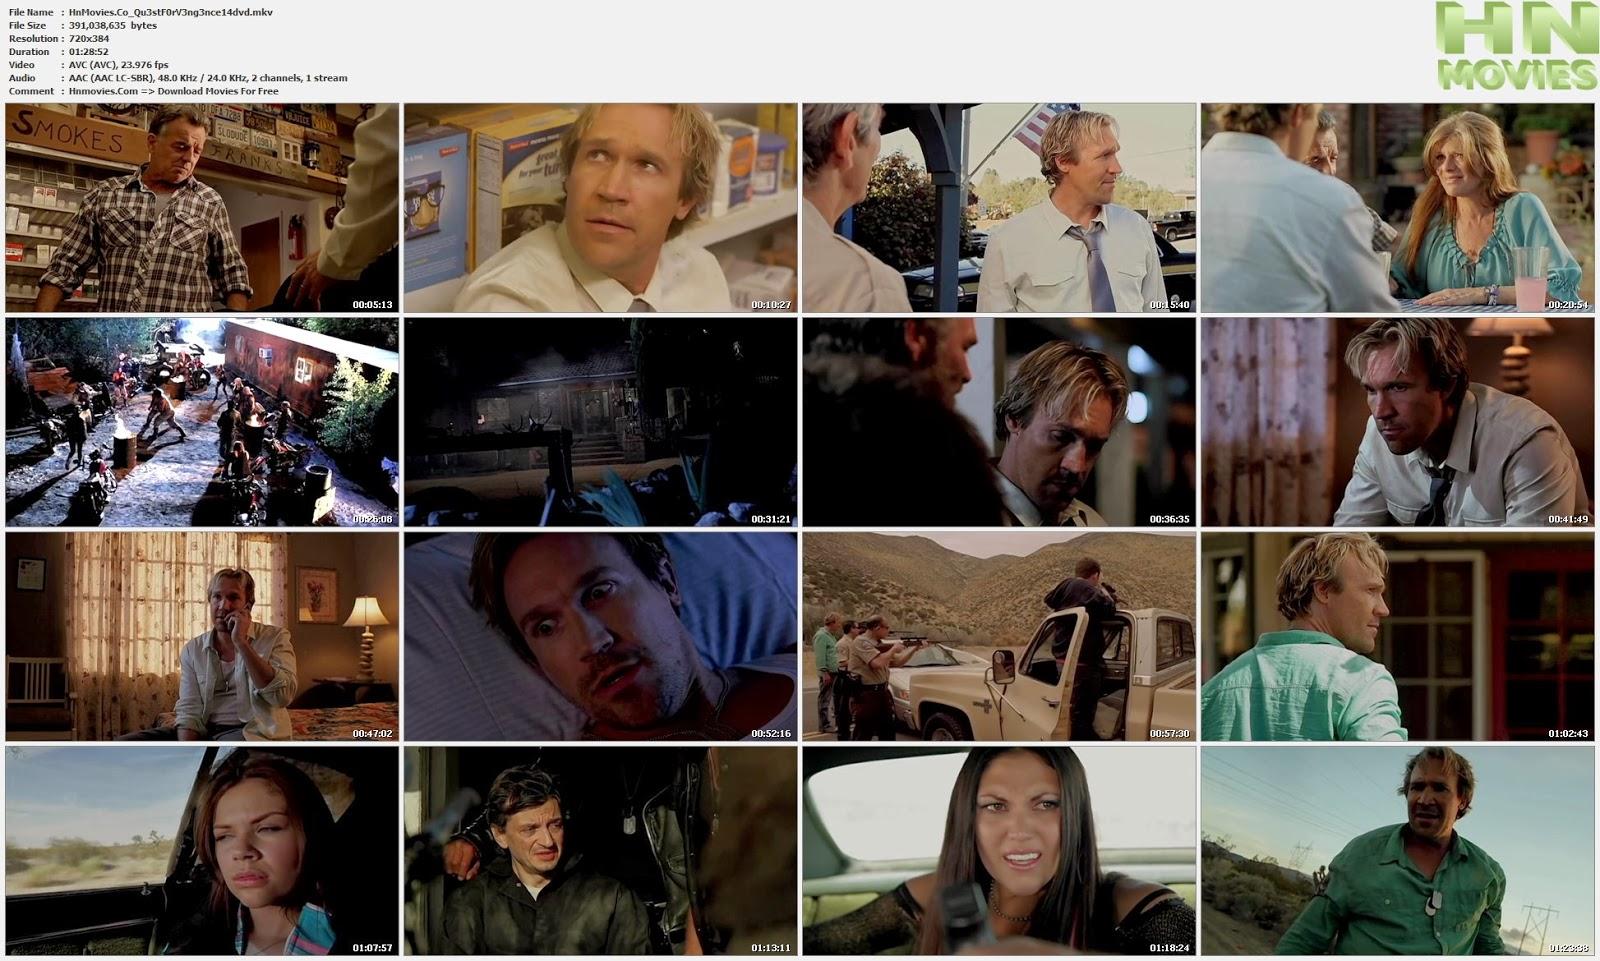 movie screenshot of The Quest for Vengeance fdmovie.com